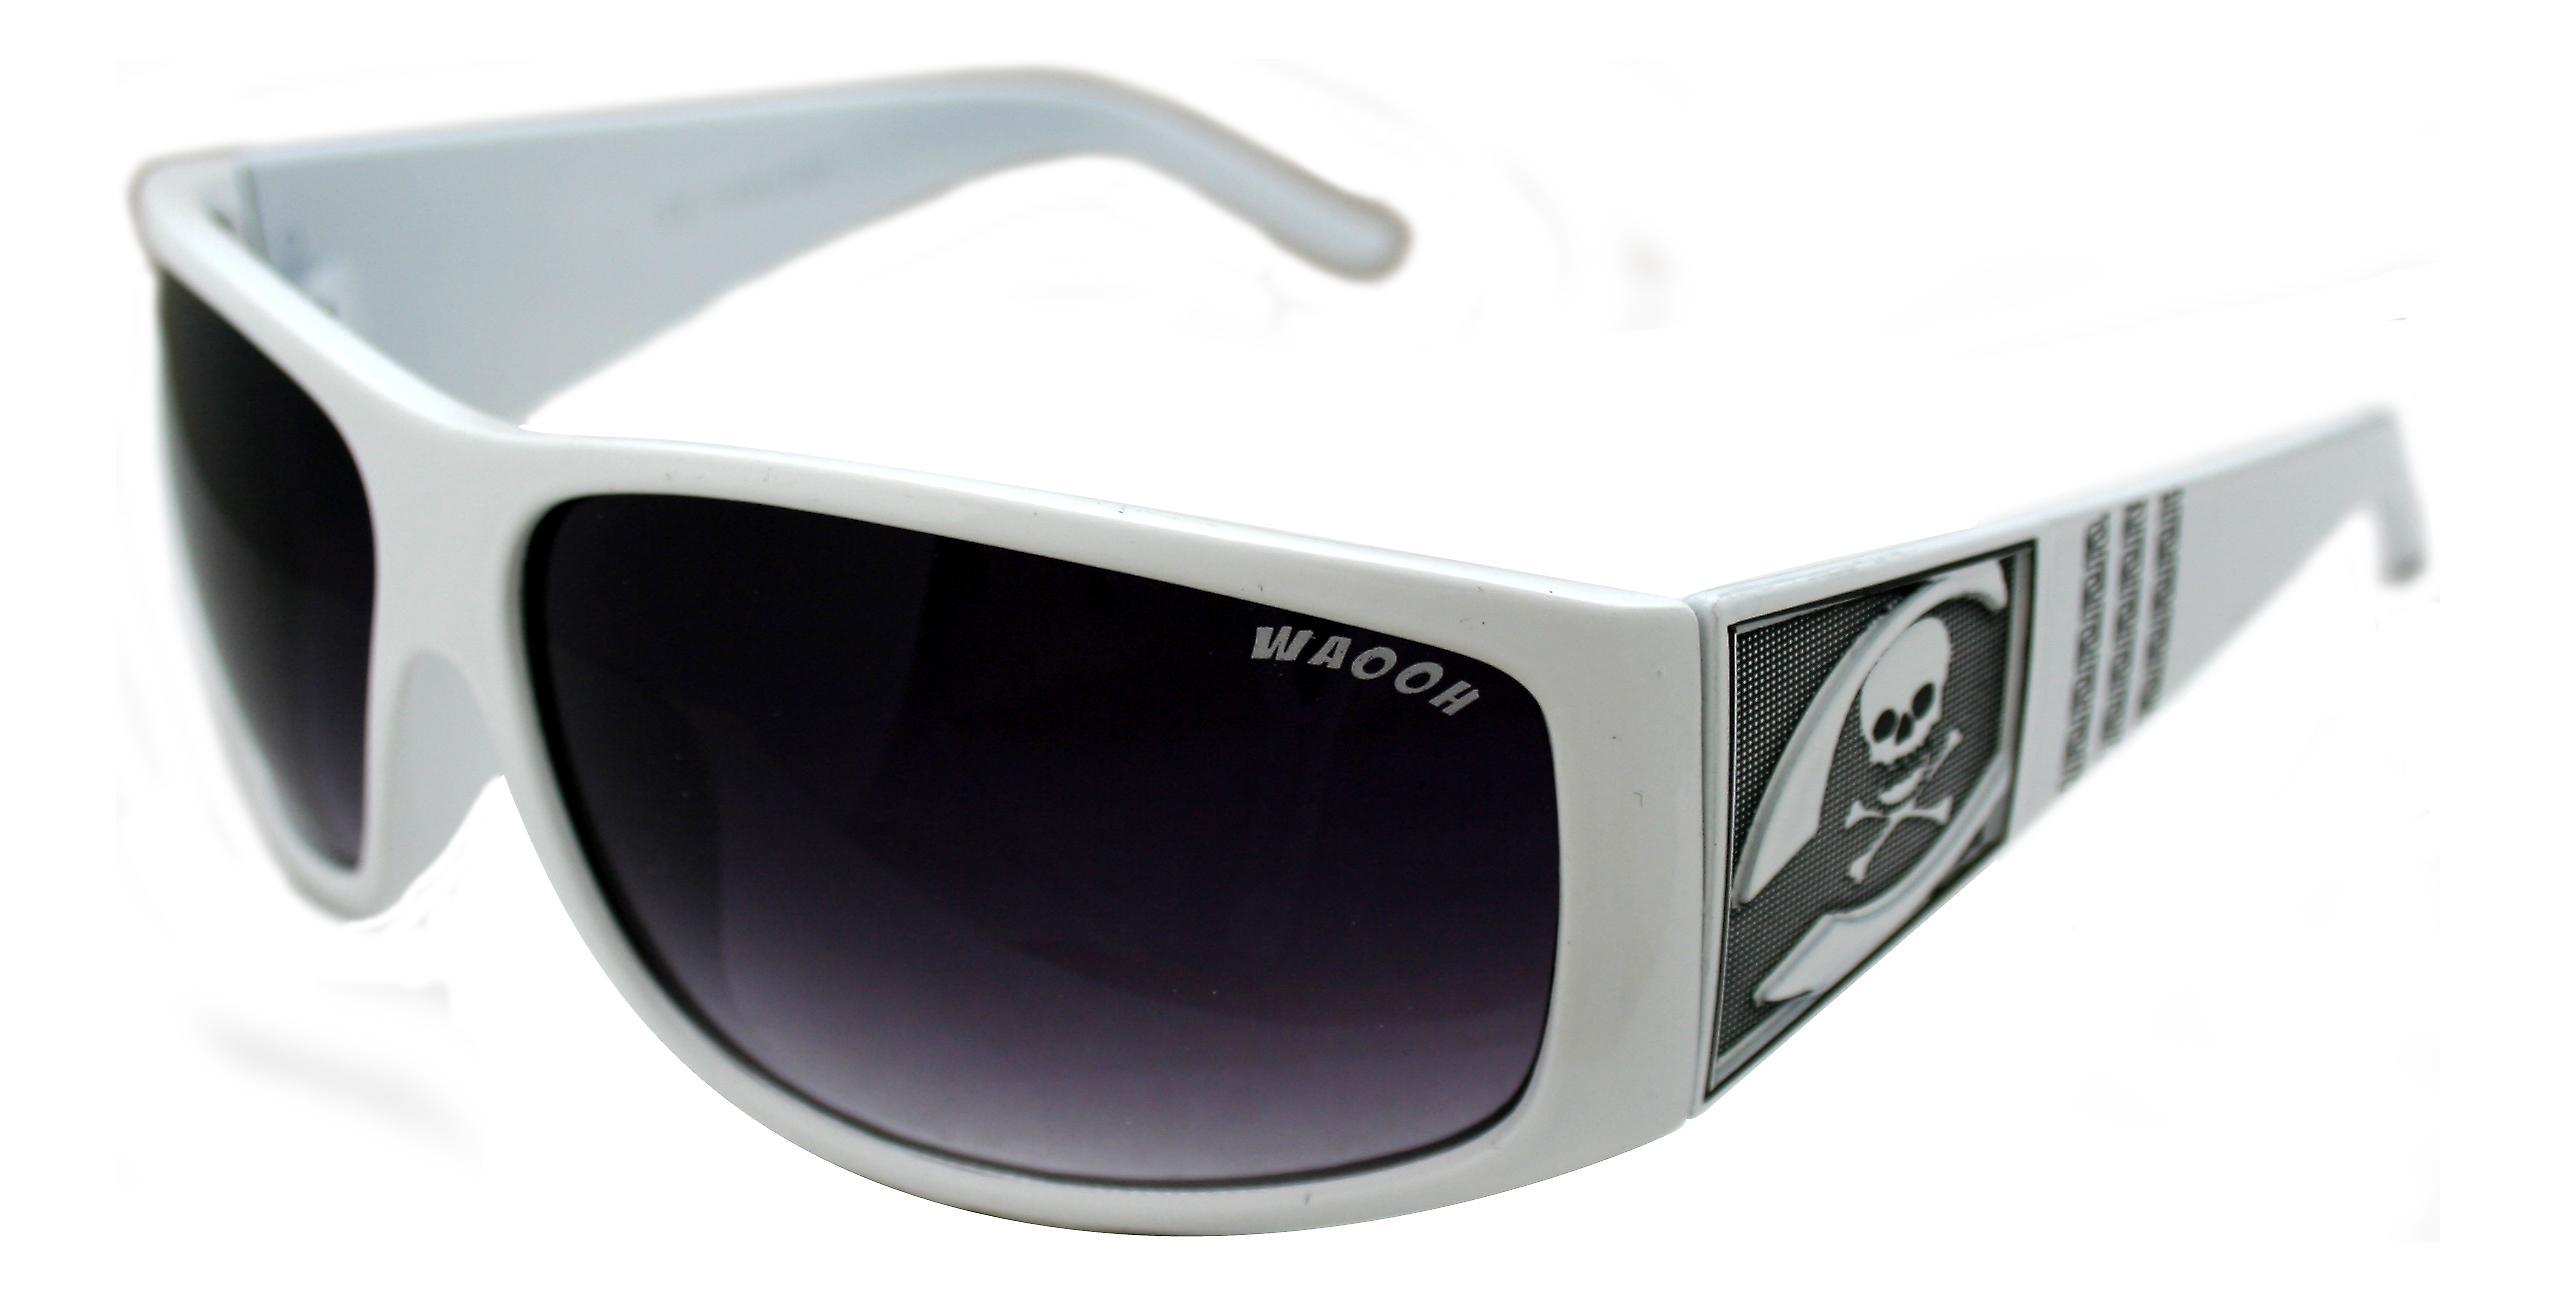 Waooh - solbriller til Sun TS834 - mønster pirat - kategori 3 - solbriller UV400 beskyttelse